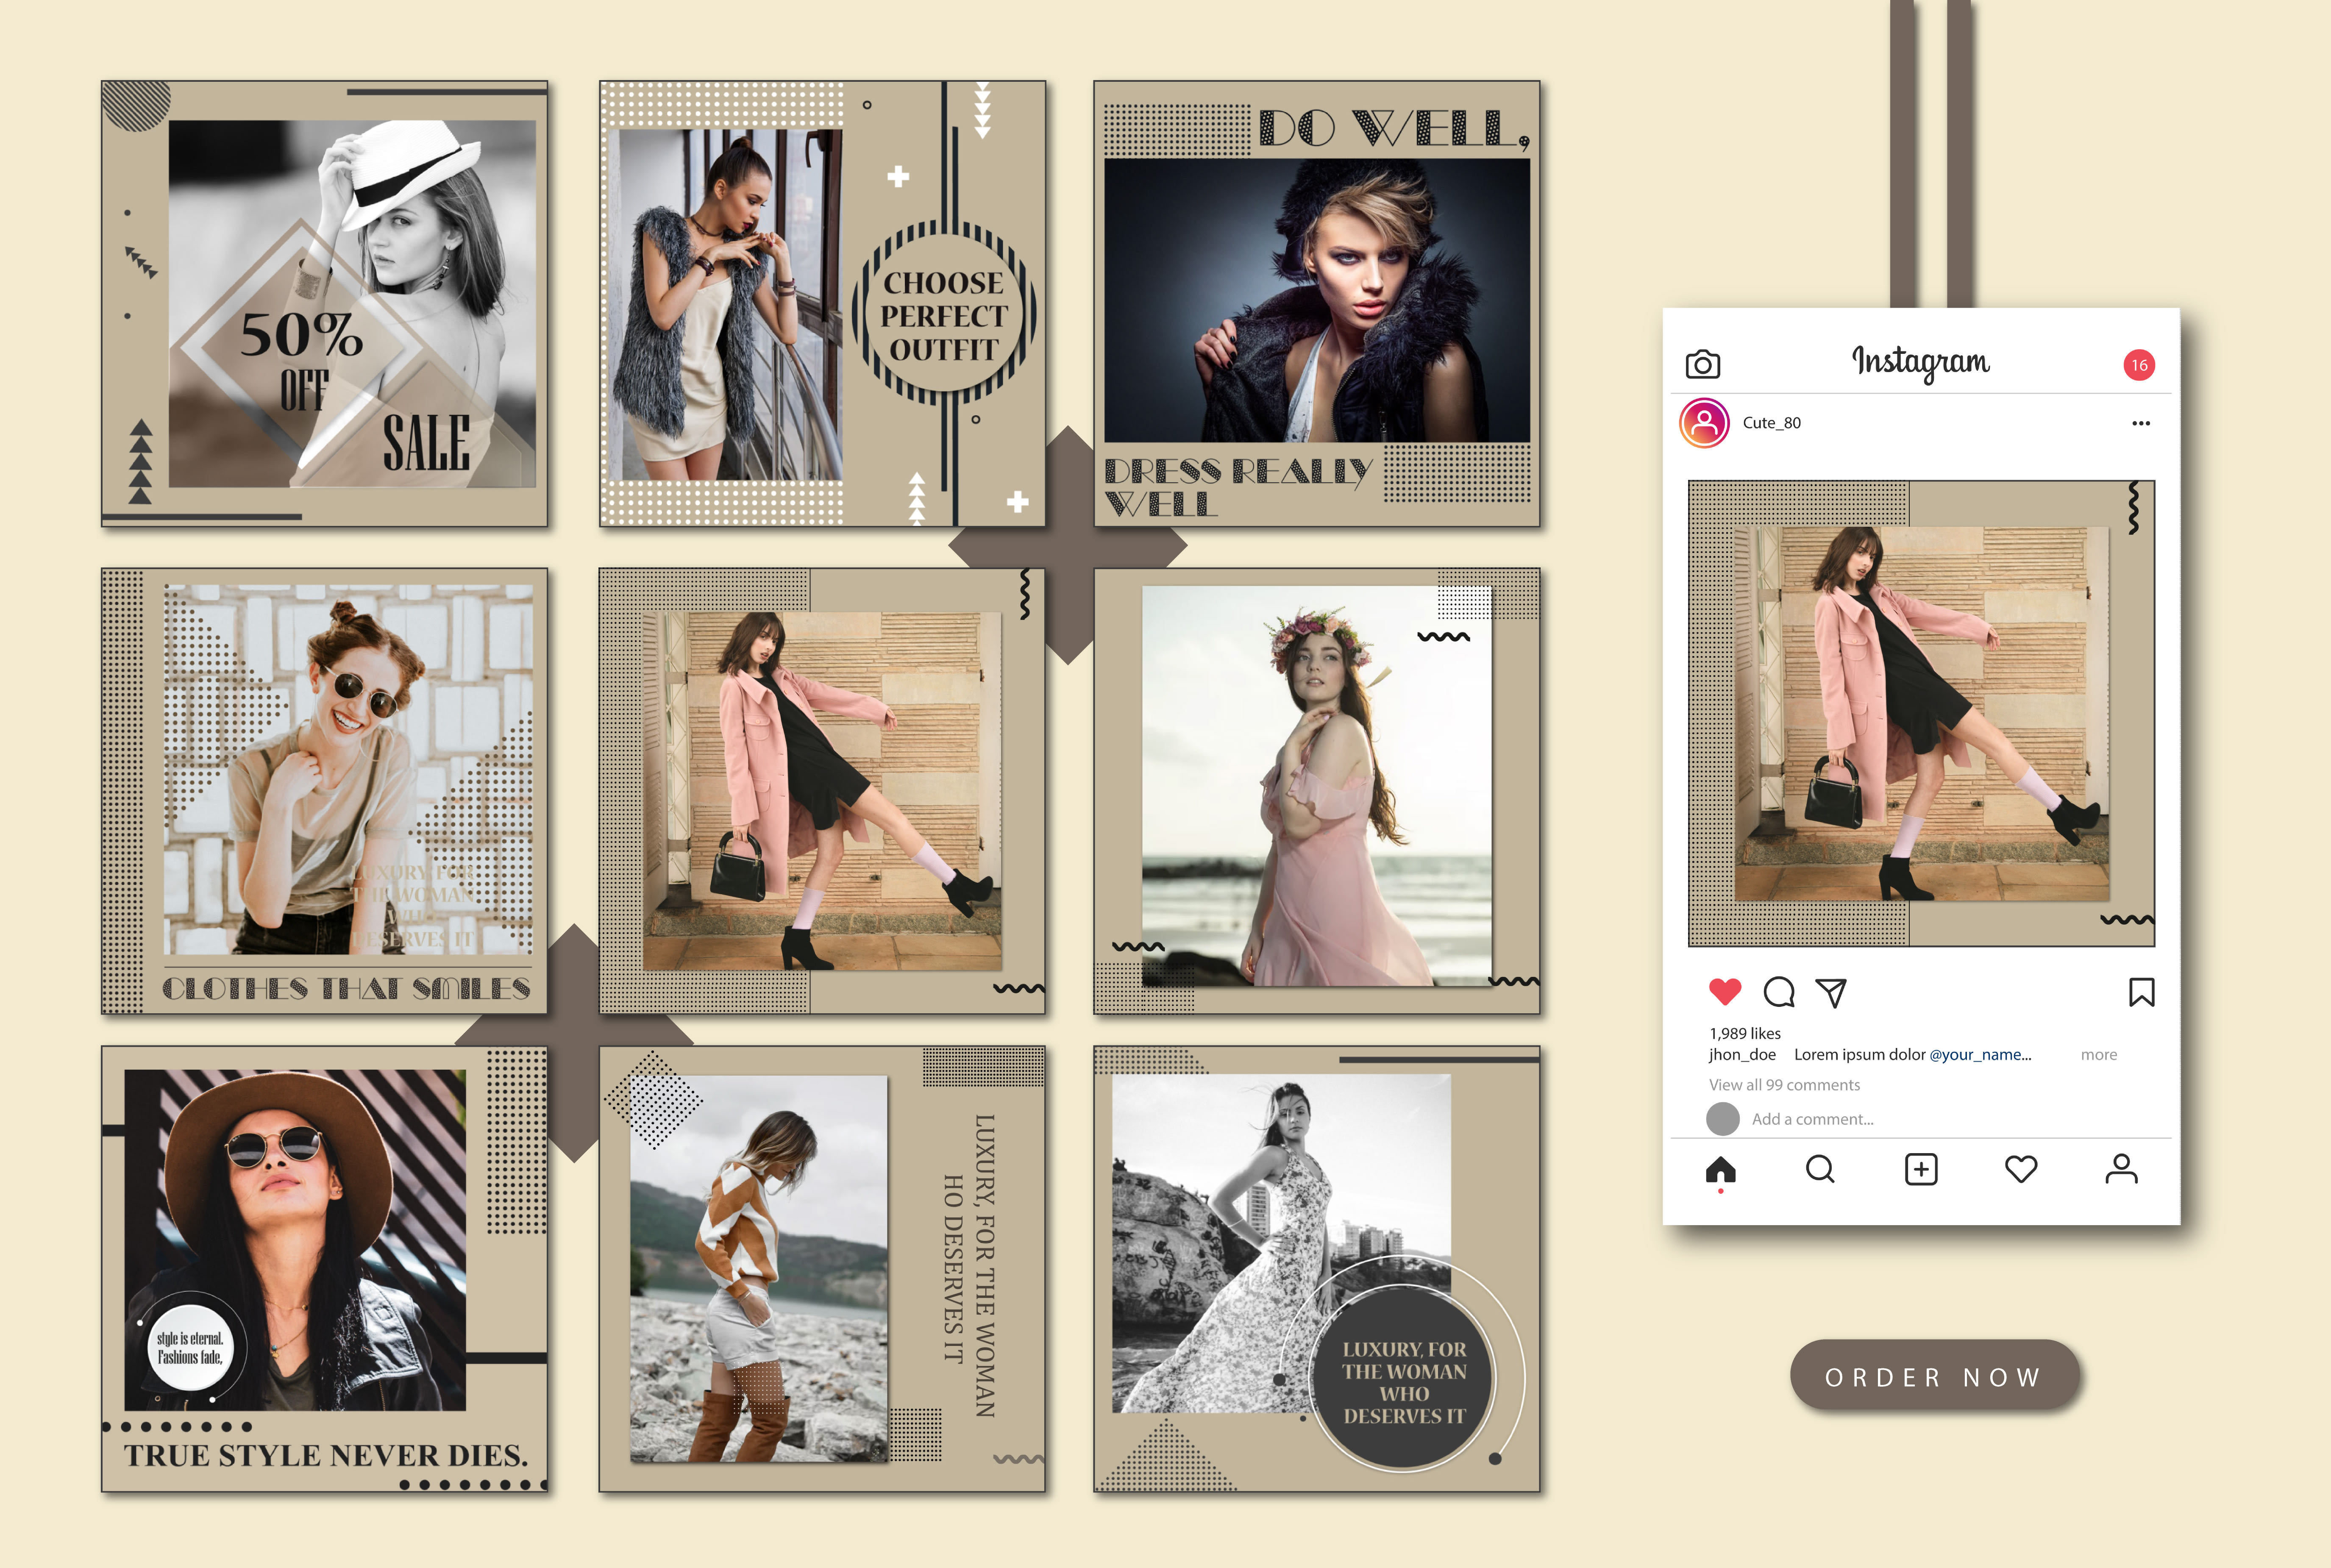 I will design instagram post images